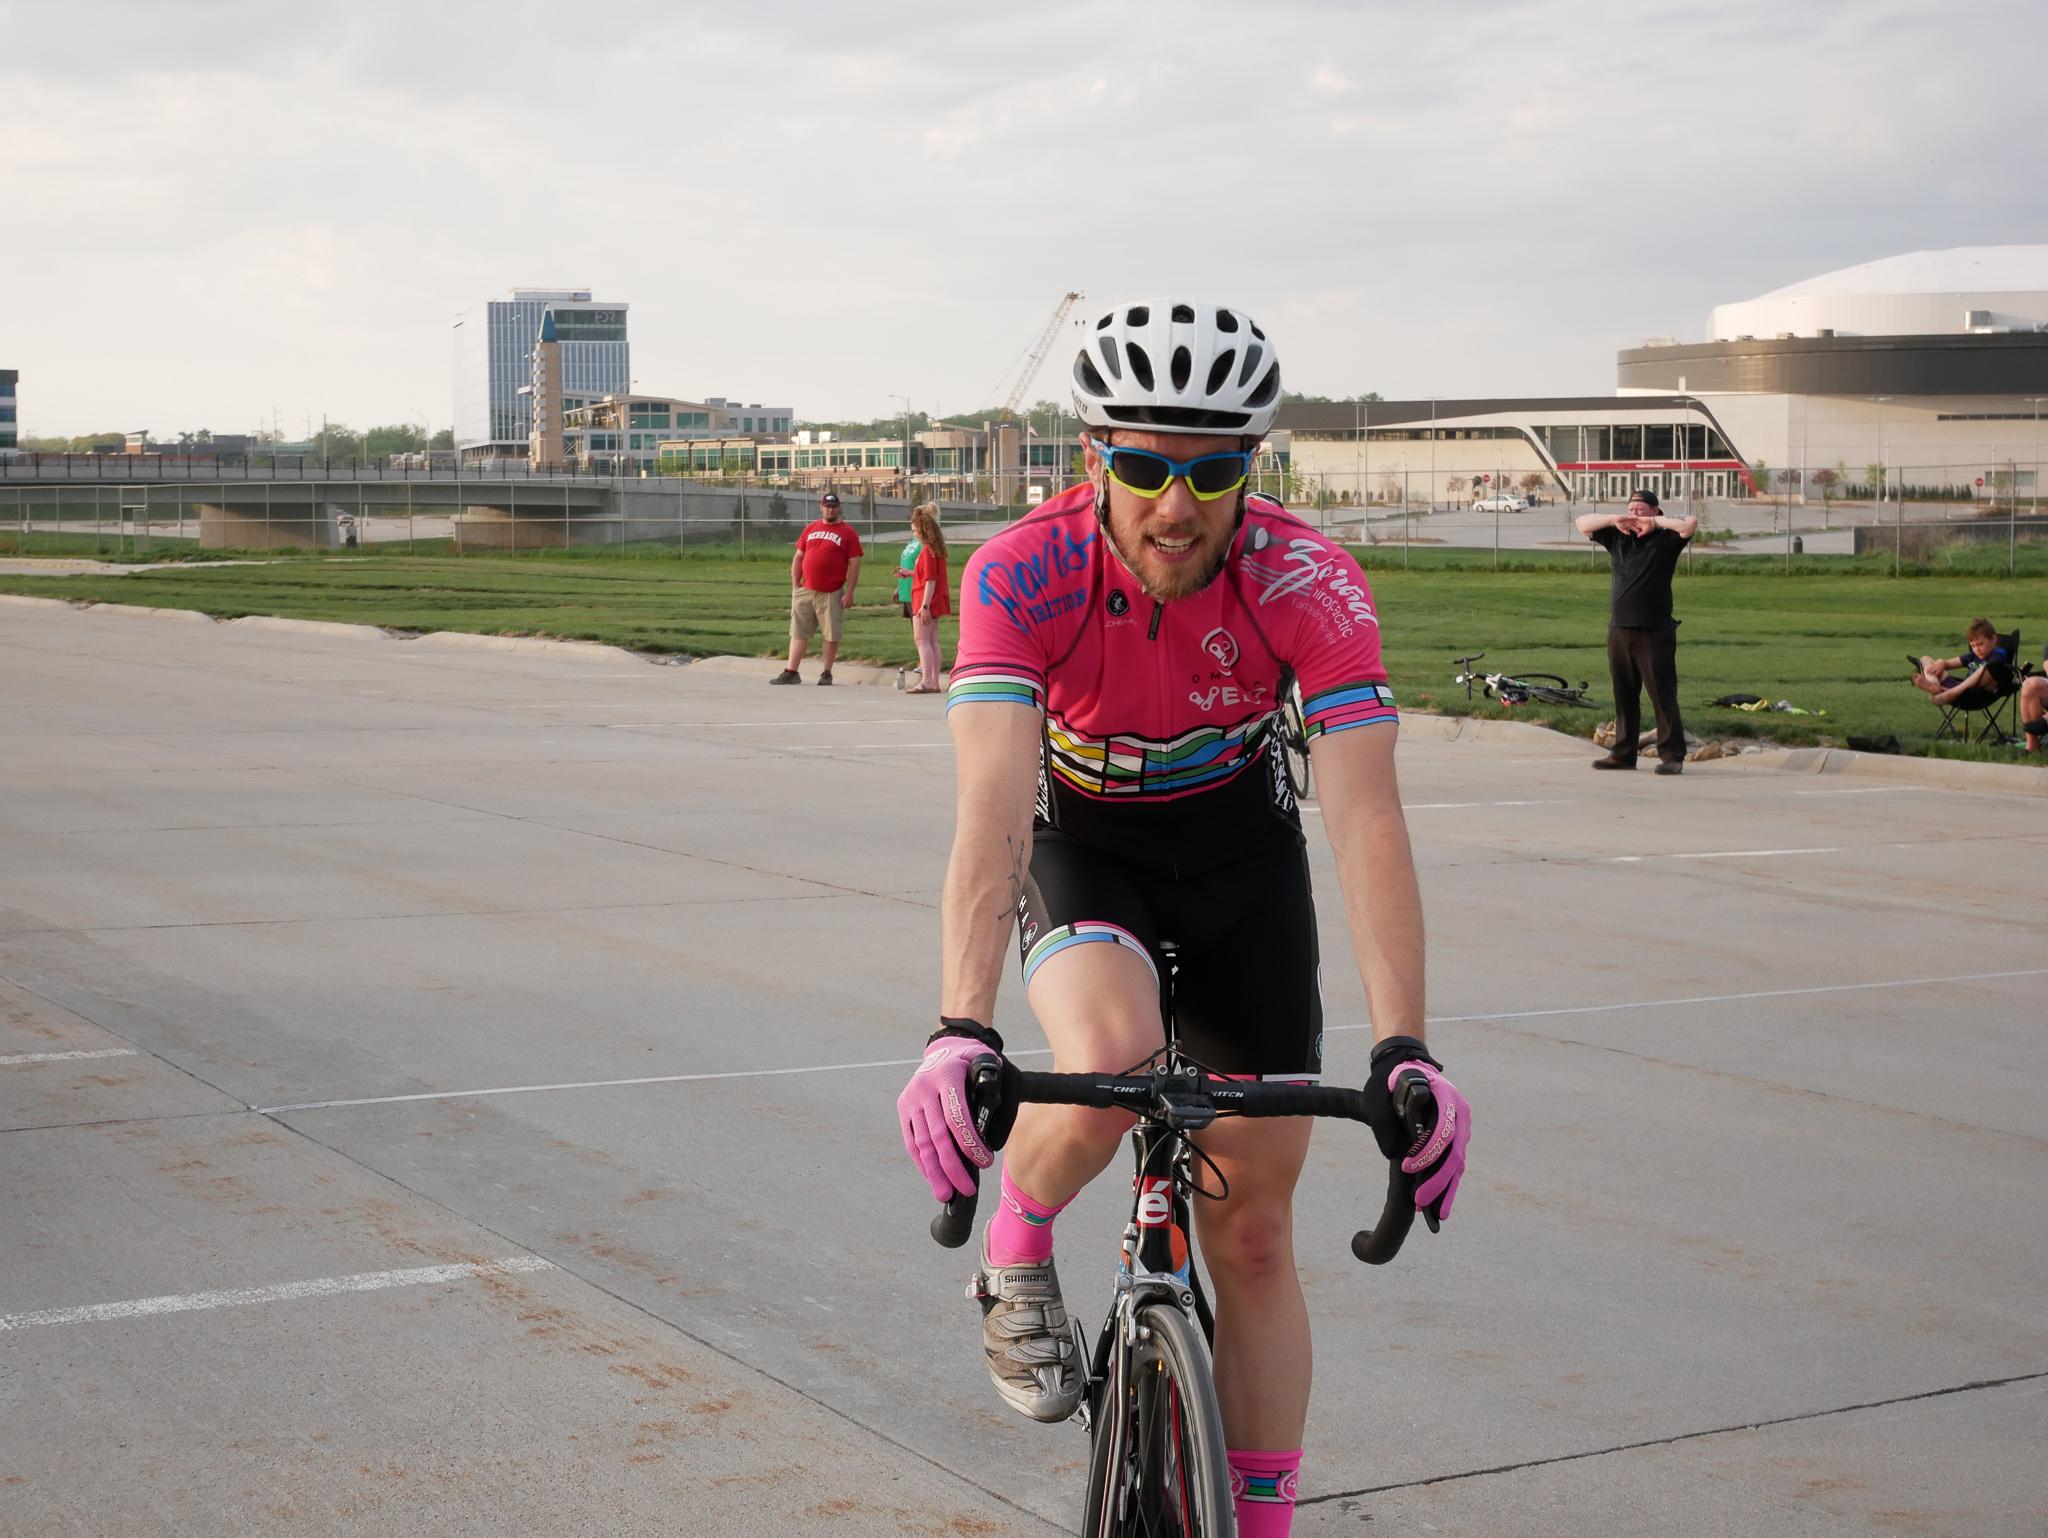 Criterium racing || Baxter Arena || Rachel Loewens